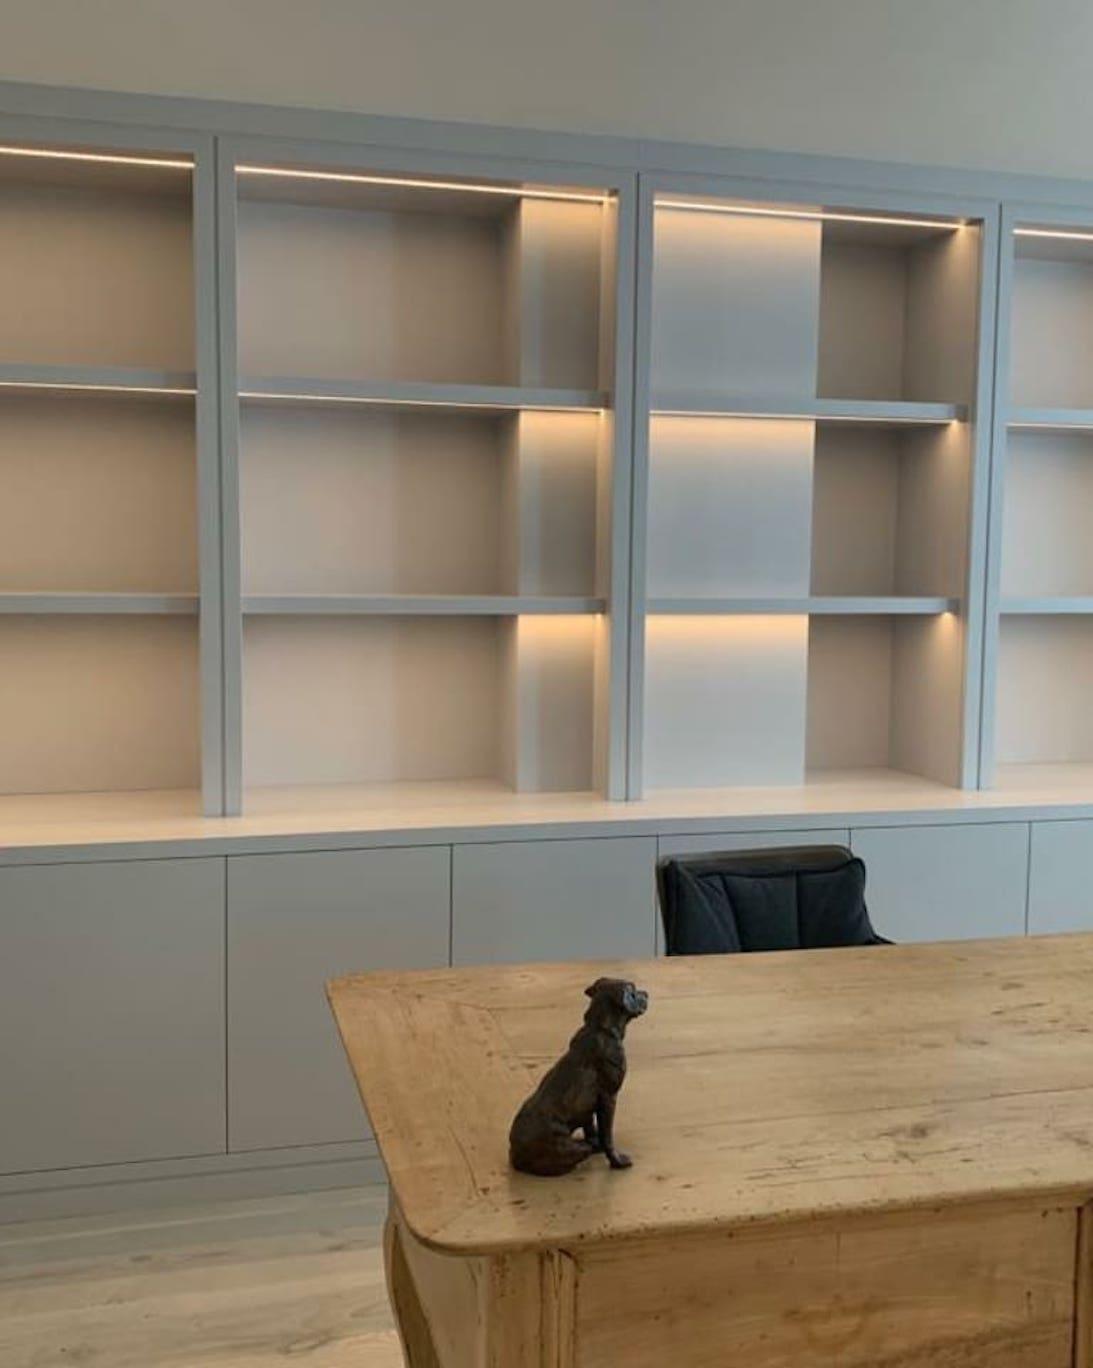 Illuminated Bookcase Dimpse1.jpg